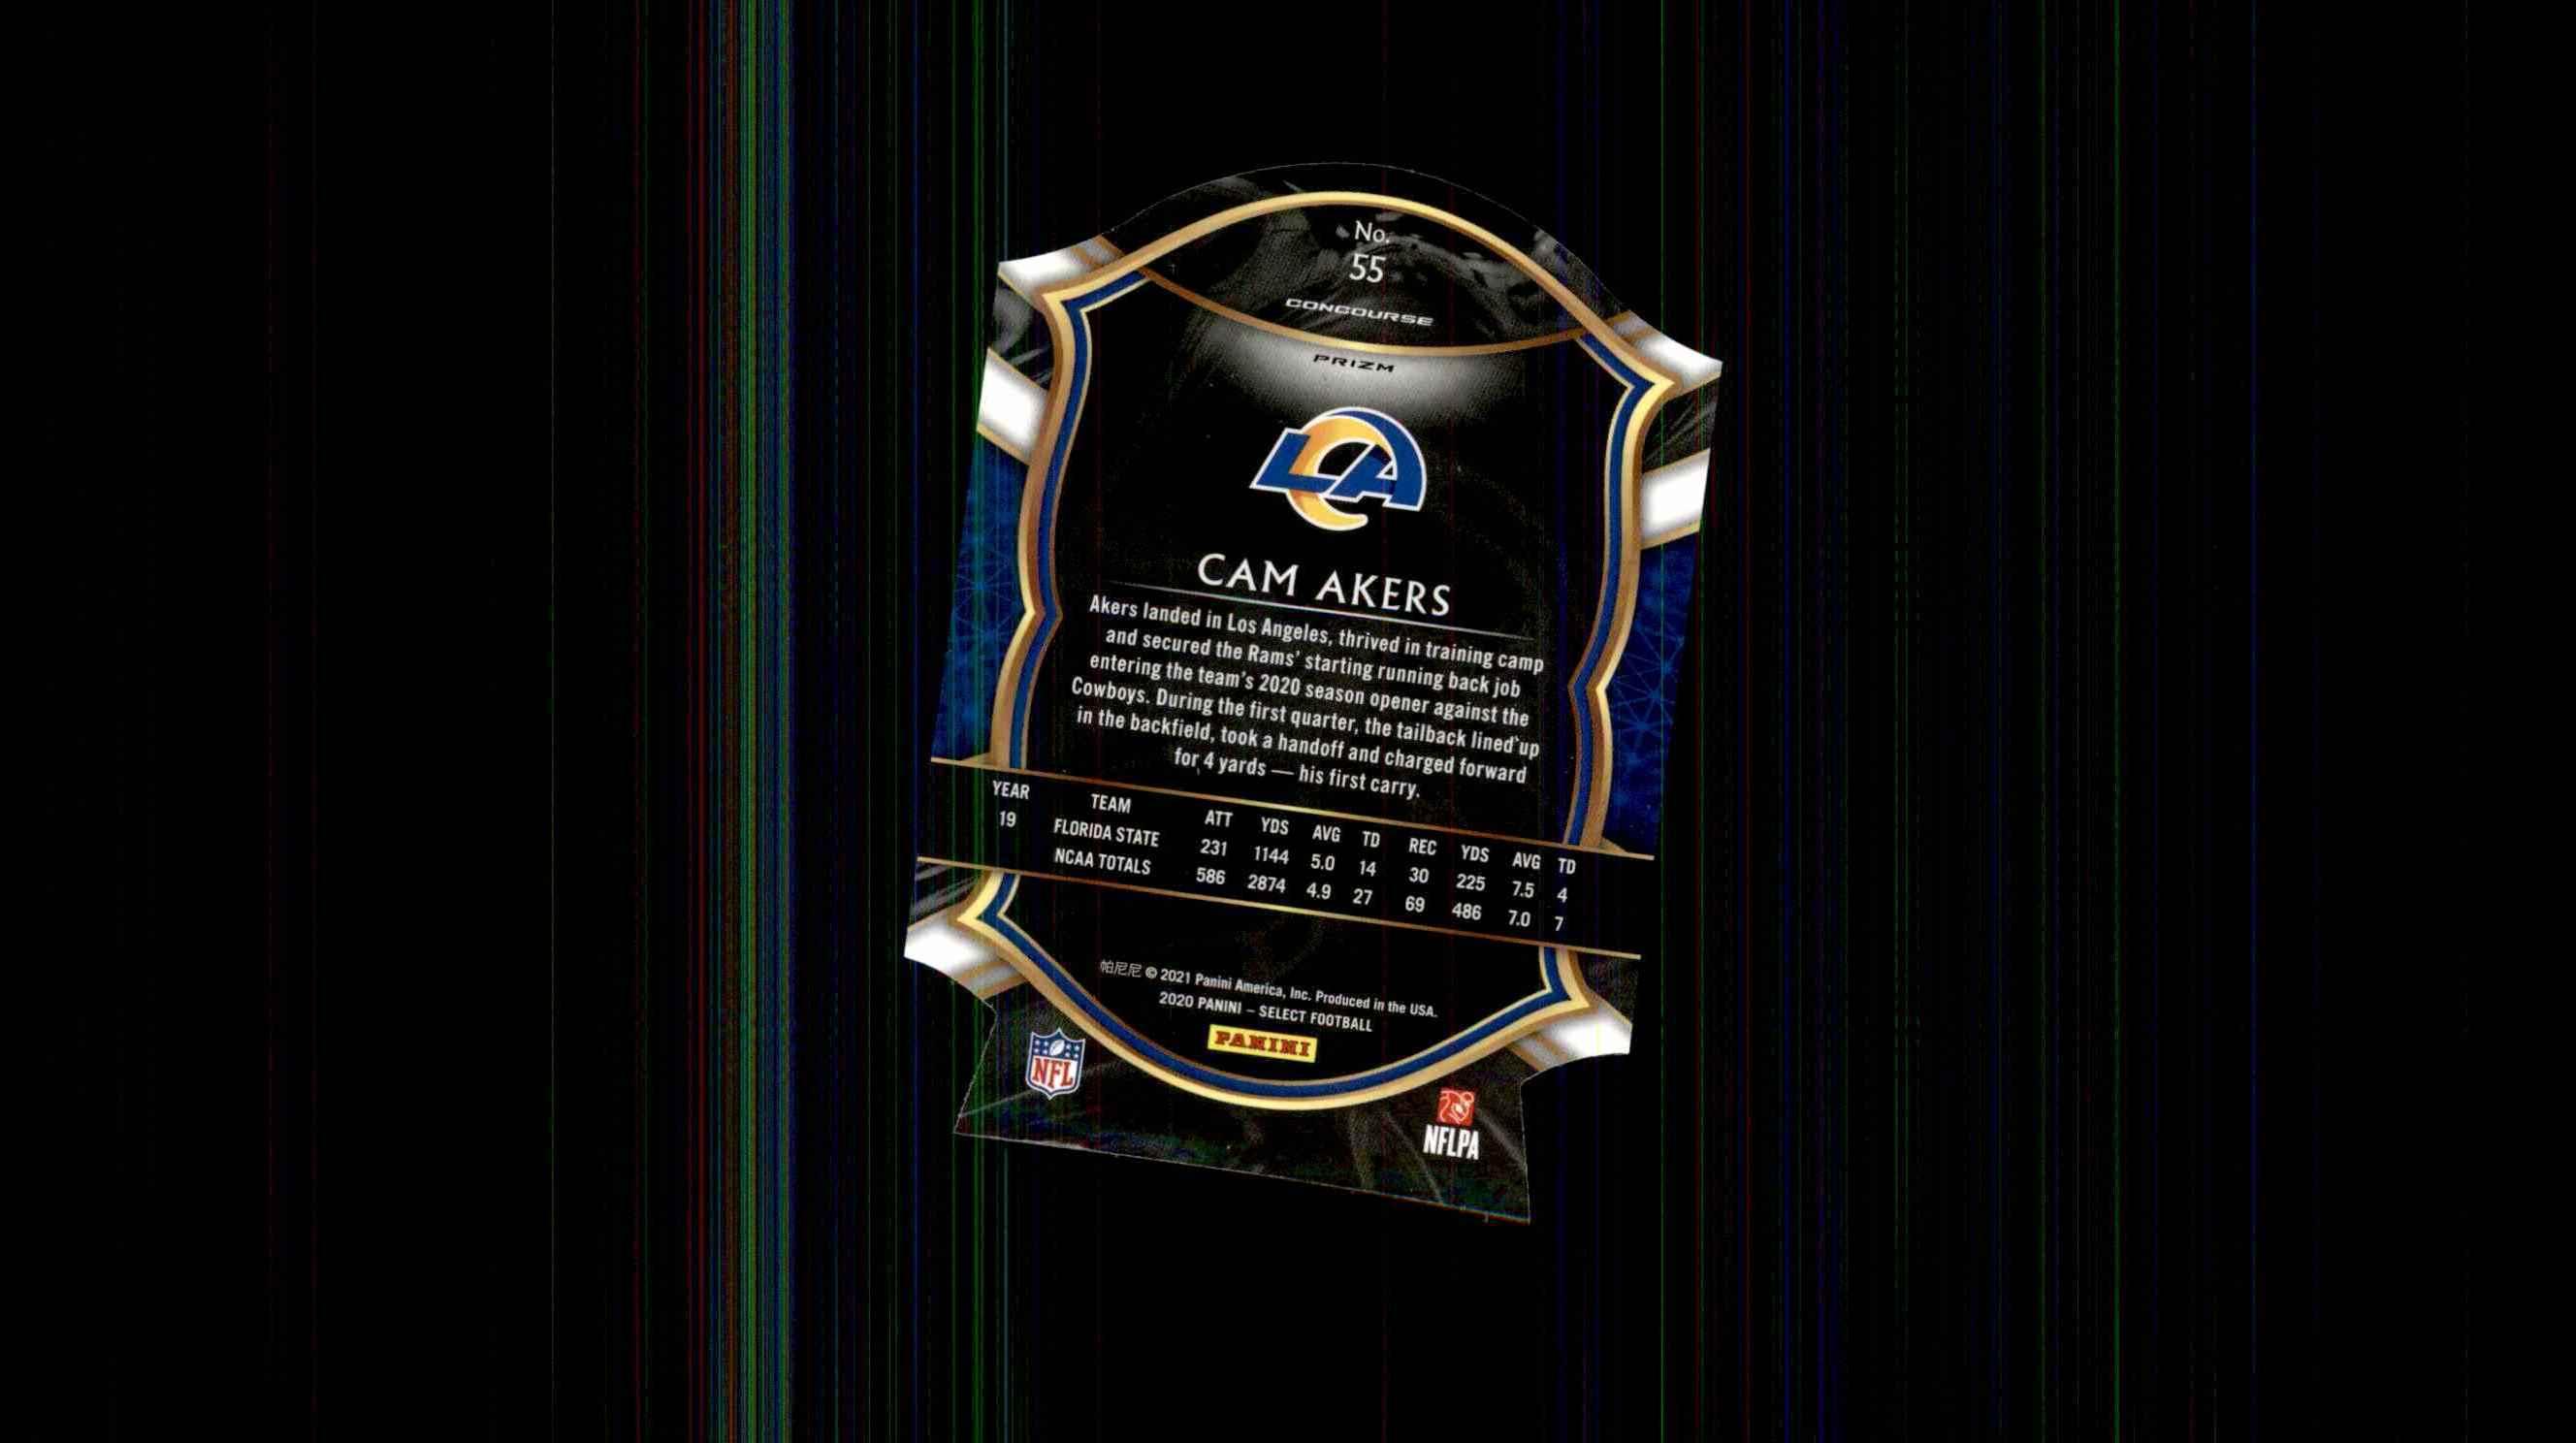 2020 Select Prizm Blue Die Cut Cam Akers #55 card back image